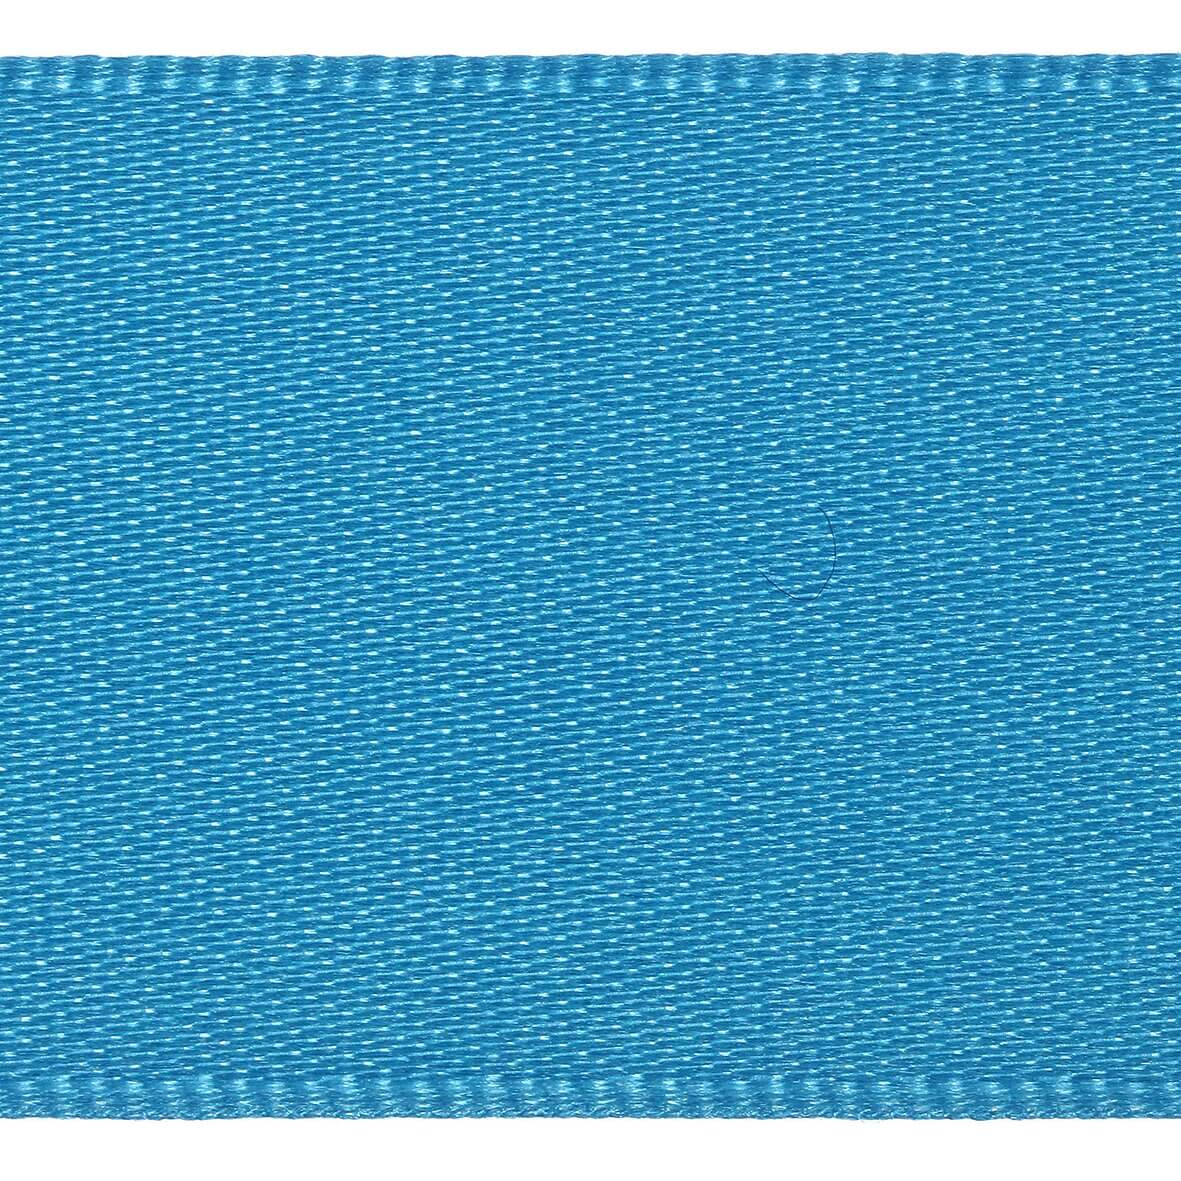 10mm Berisfords Satin Ribbon - Peacock Colour 4